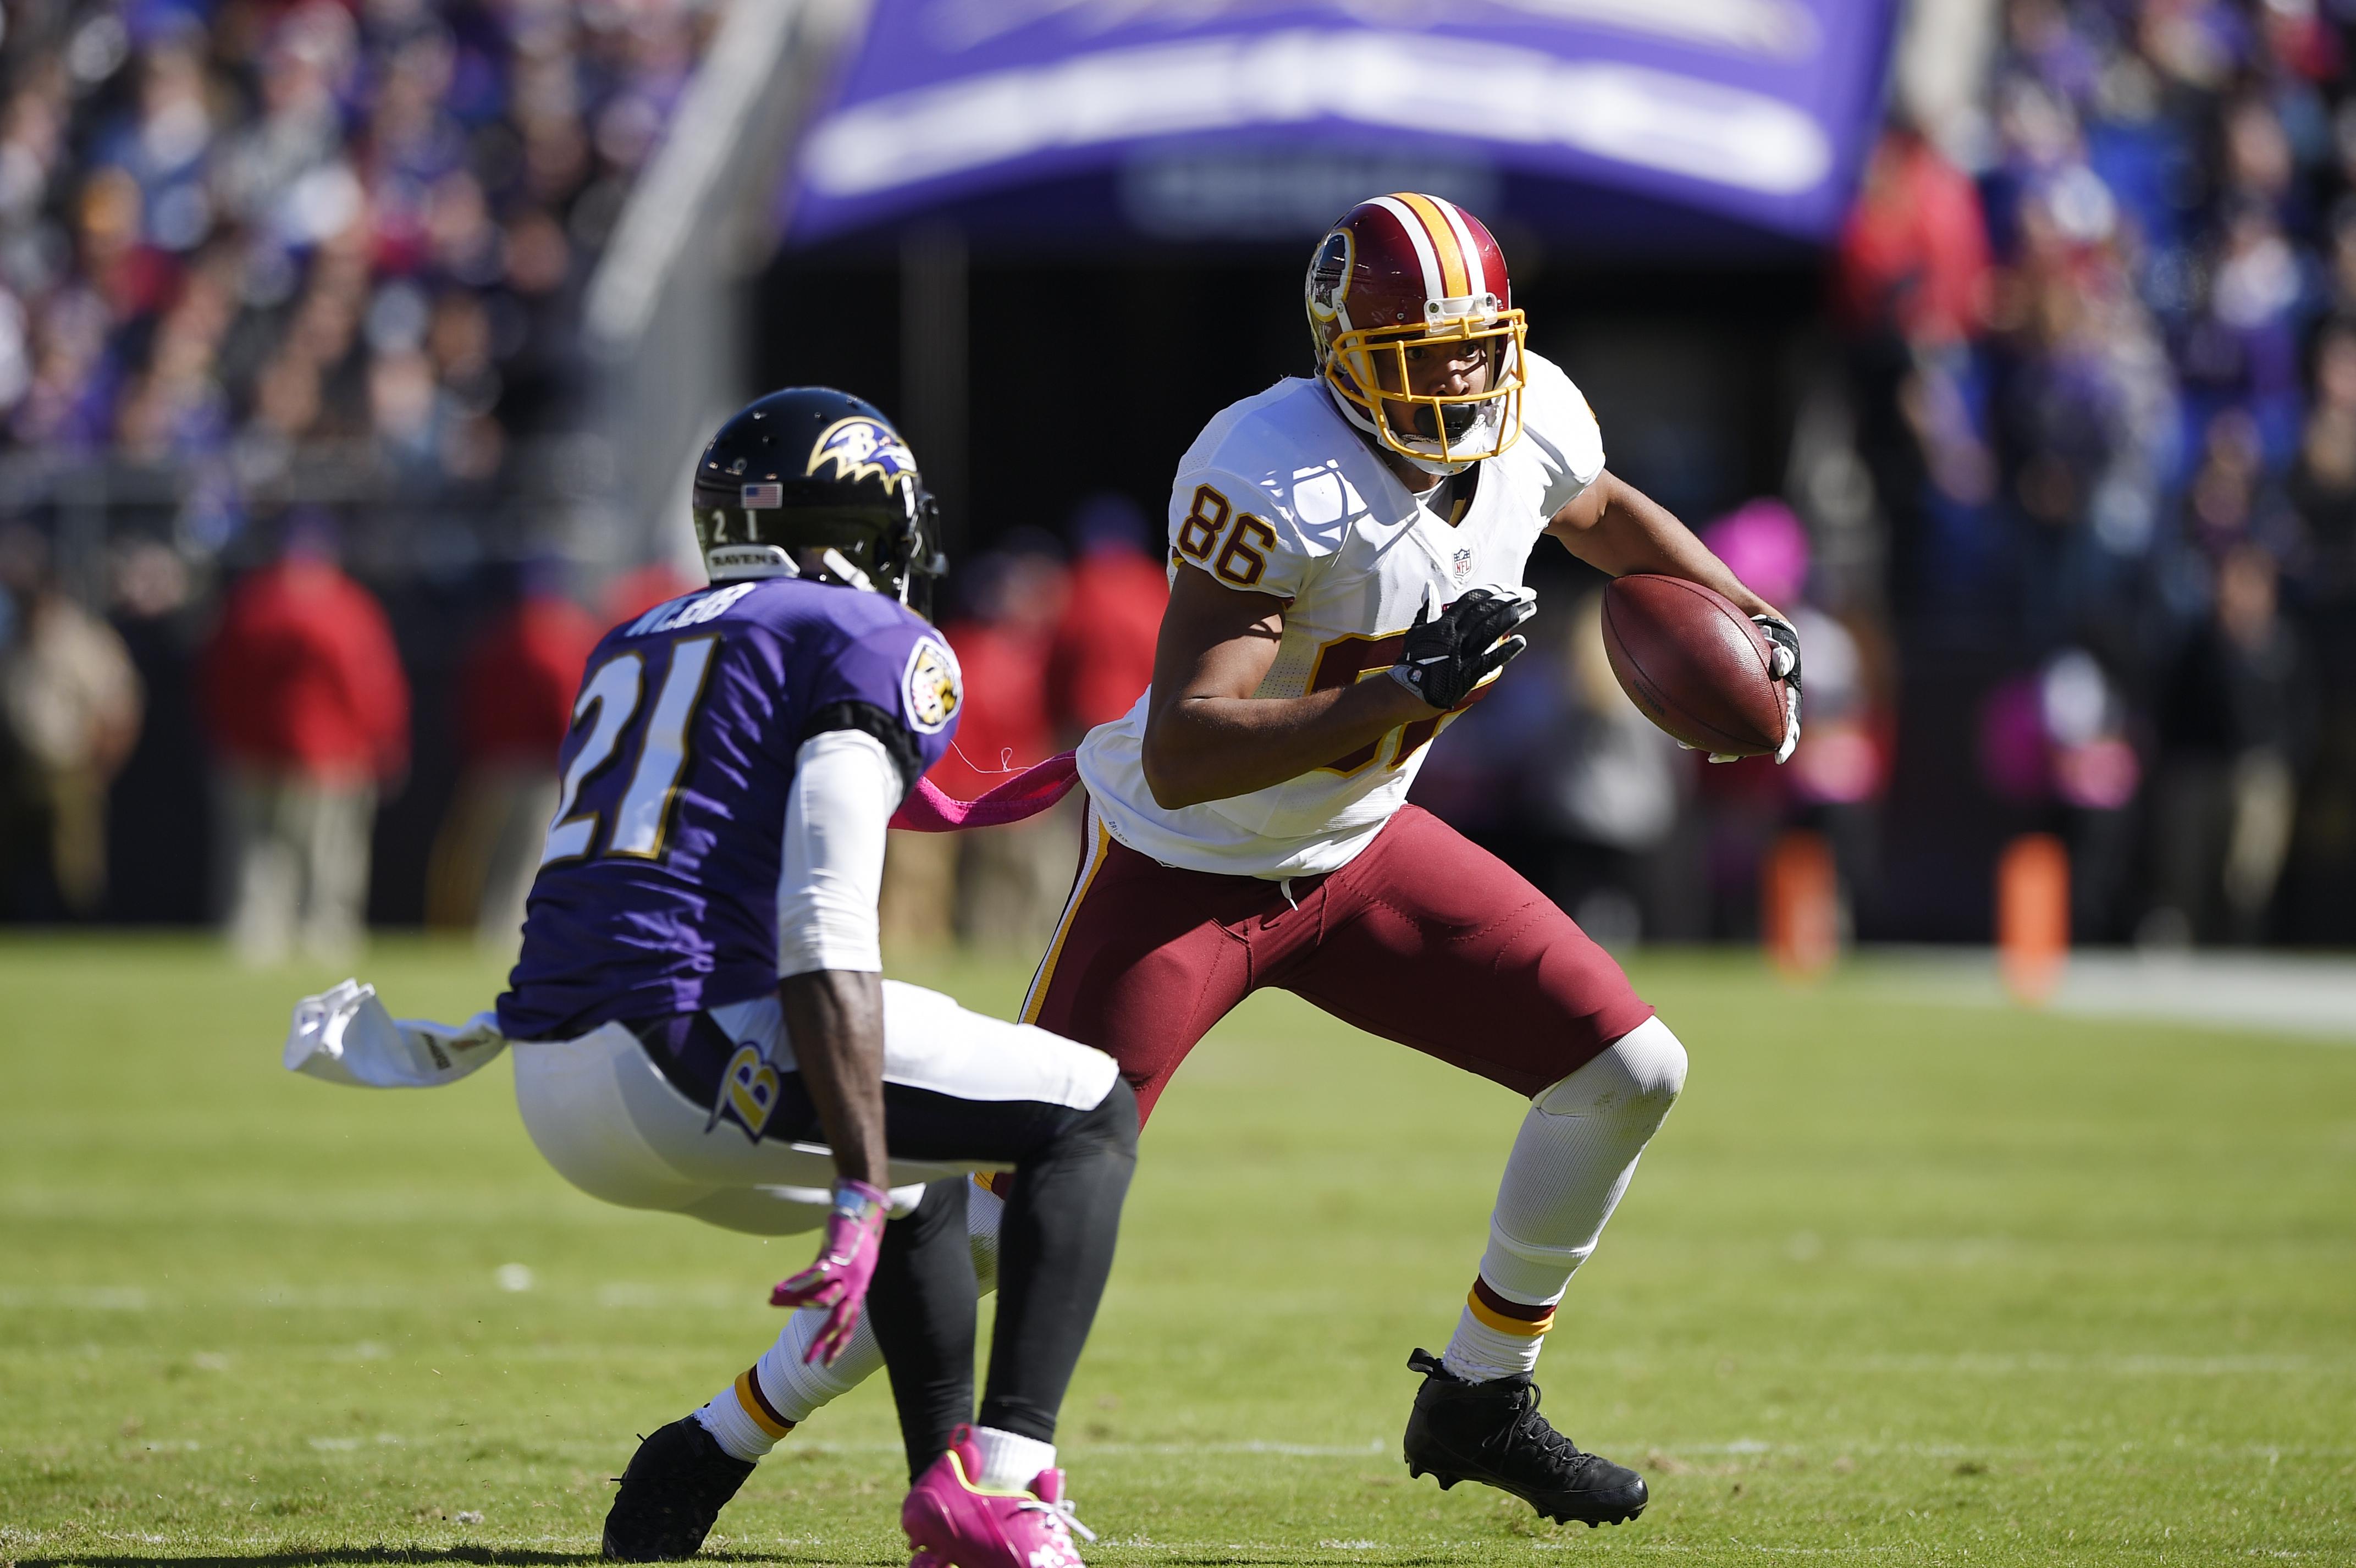 In this photo taken Oct. 9, 2016, Washington Redskins' Jordan Reed (86) runs against Baltimore Ravens' Lardarius Webb (21) during the first half of an NFL football game in Baltimore. Reed and Washington Redskins wide receiver Jackson have missed practice,